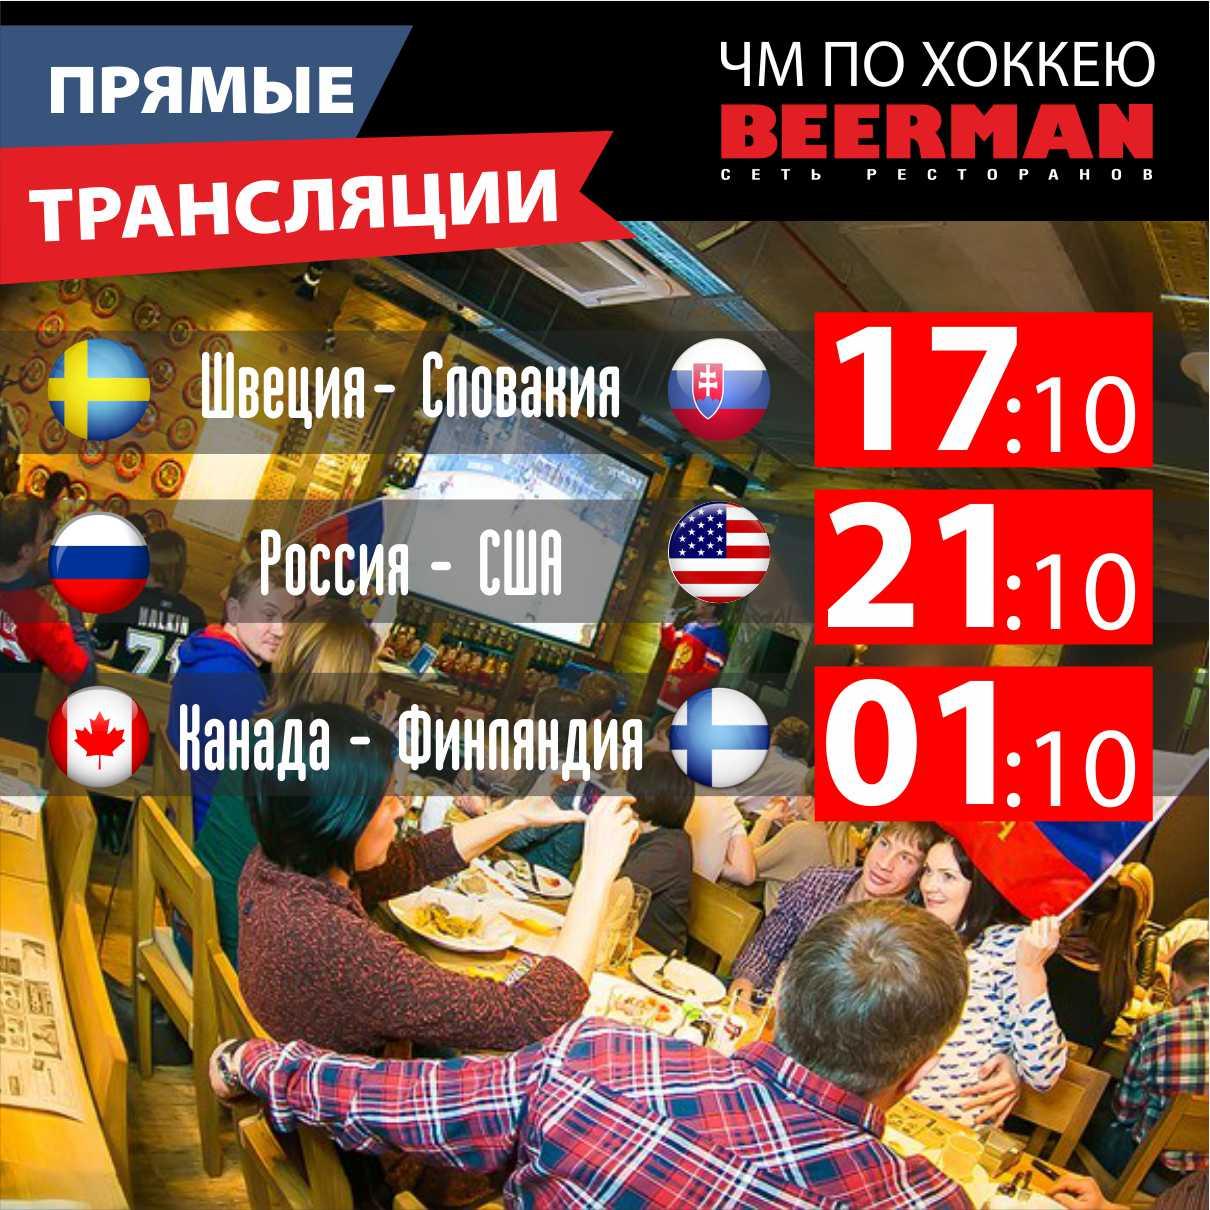 ЧМ ХОККЕЙ_6